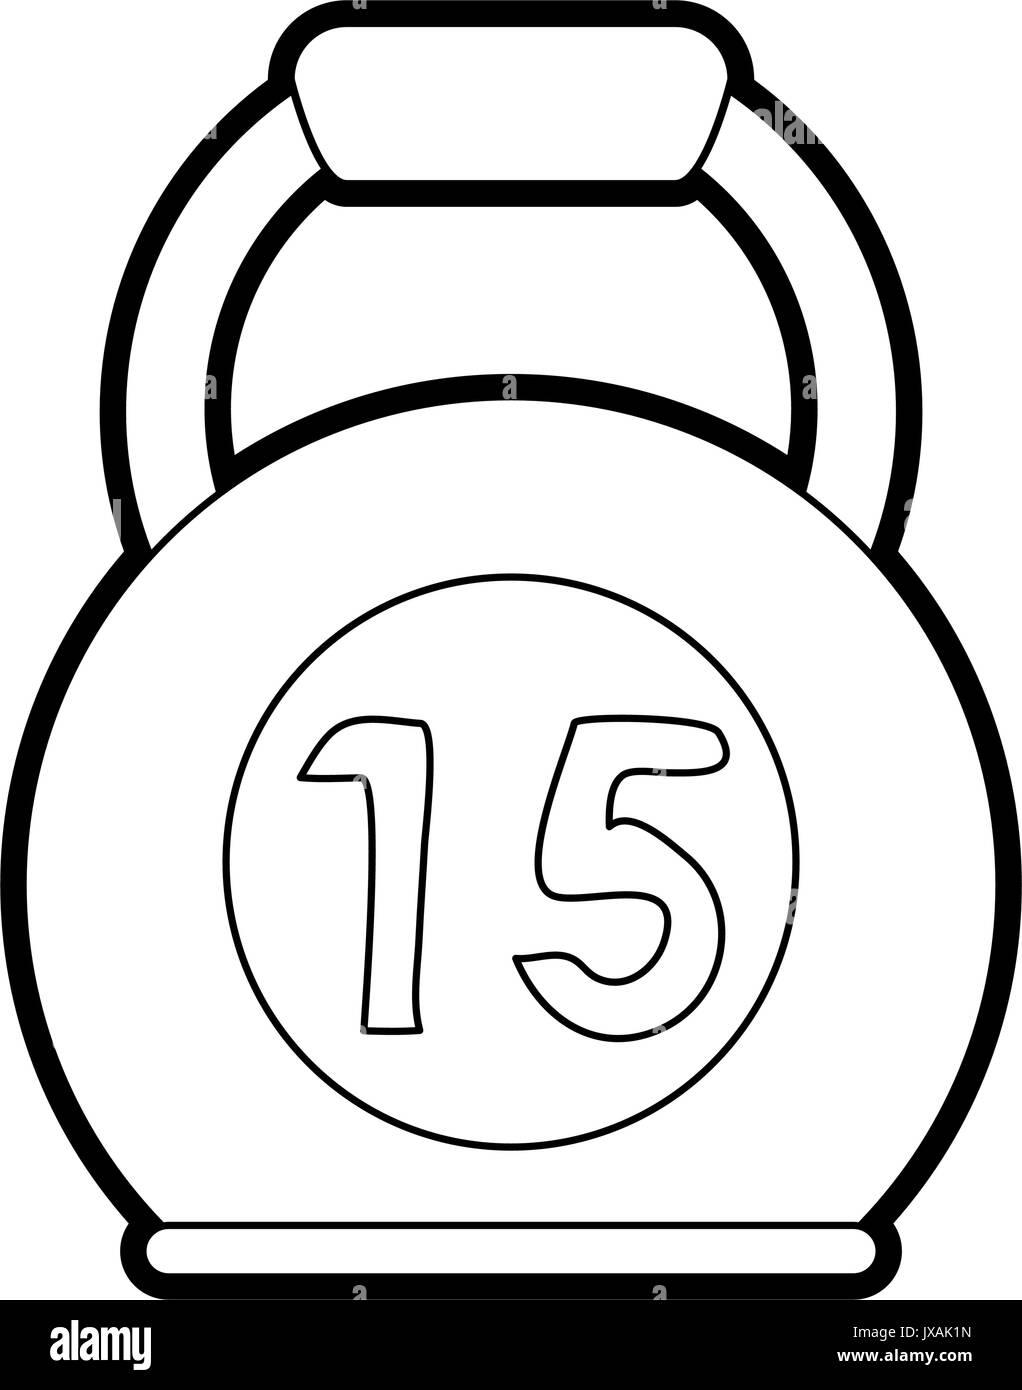 kettlebell vector illustration - Stock Image